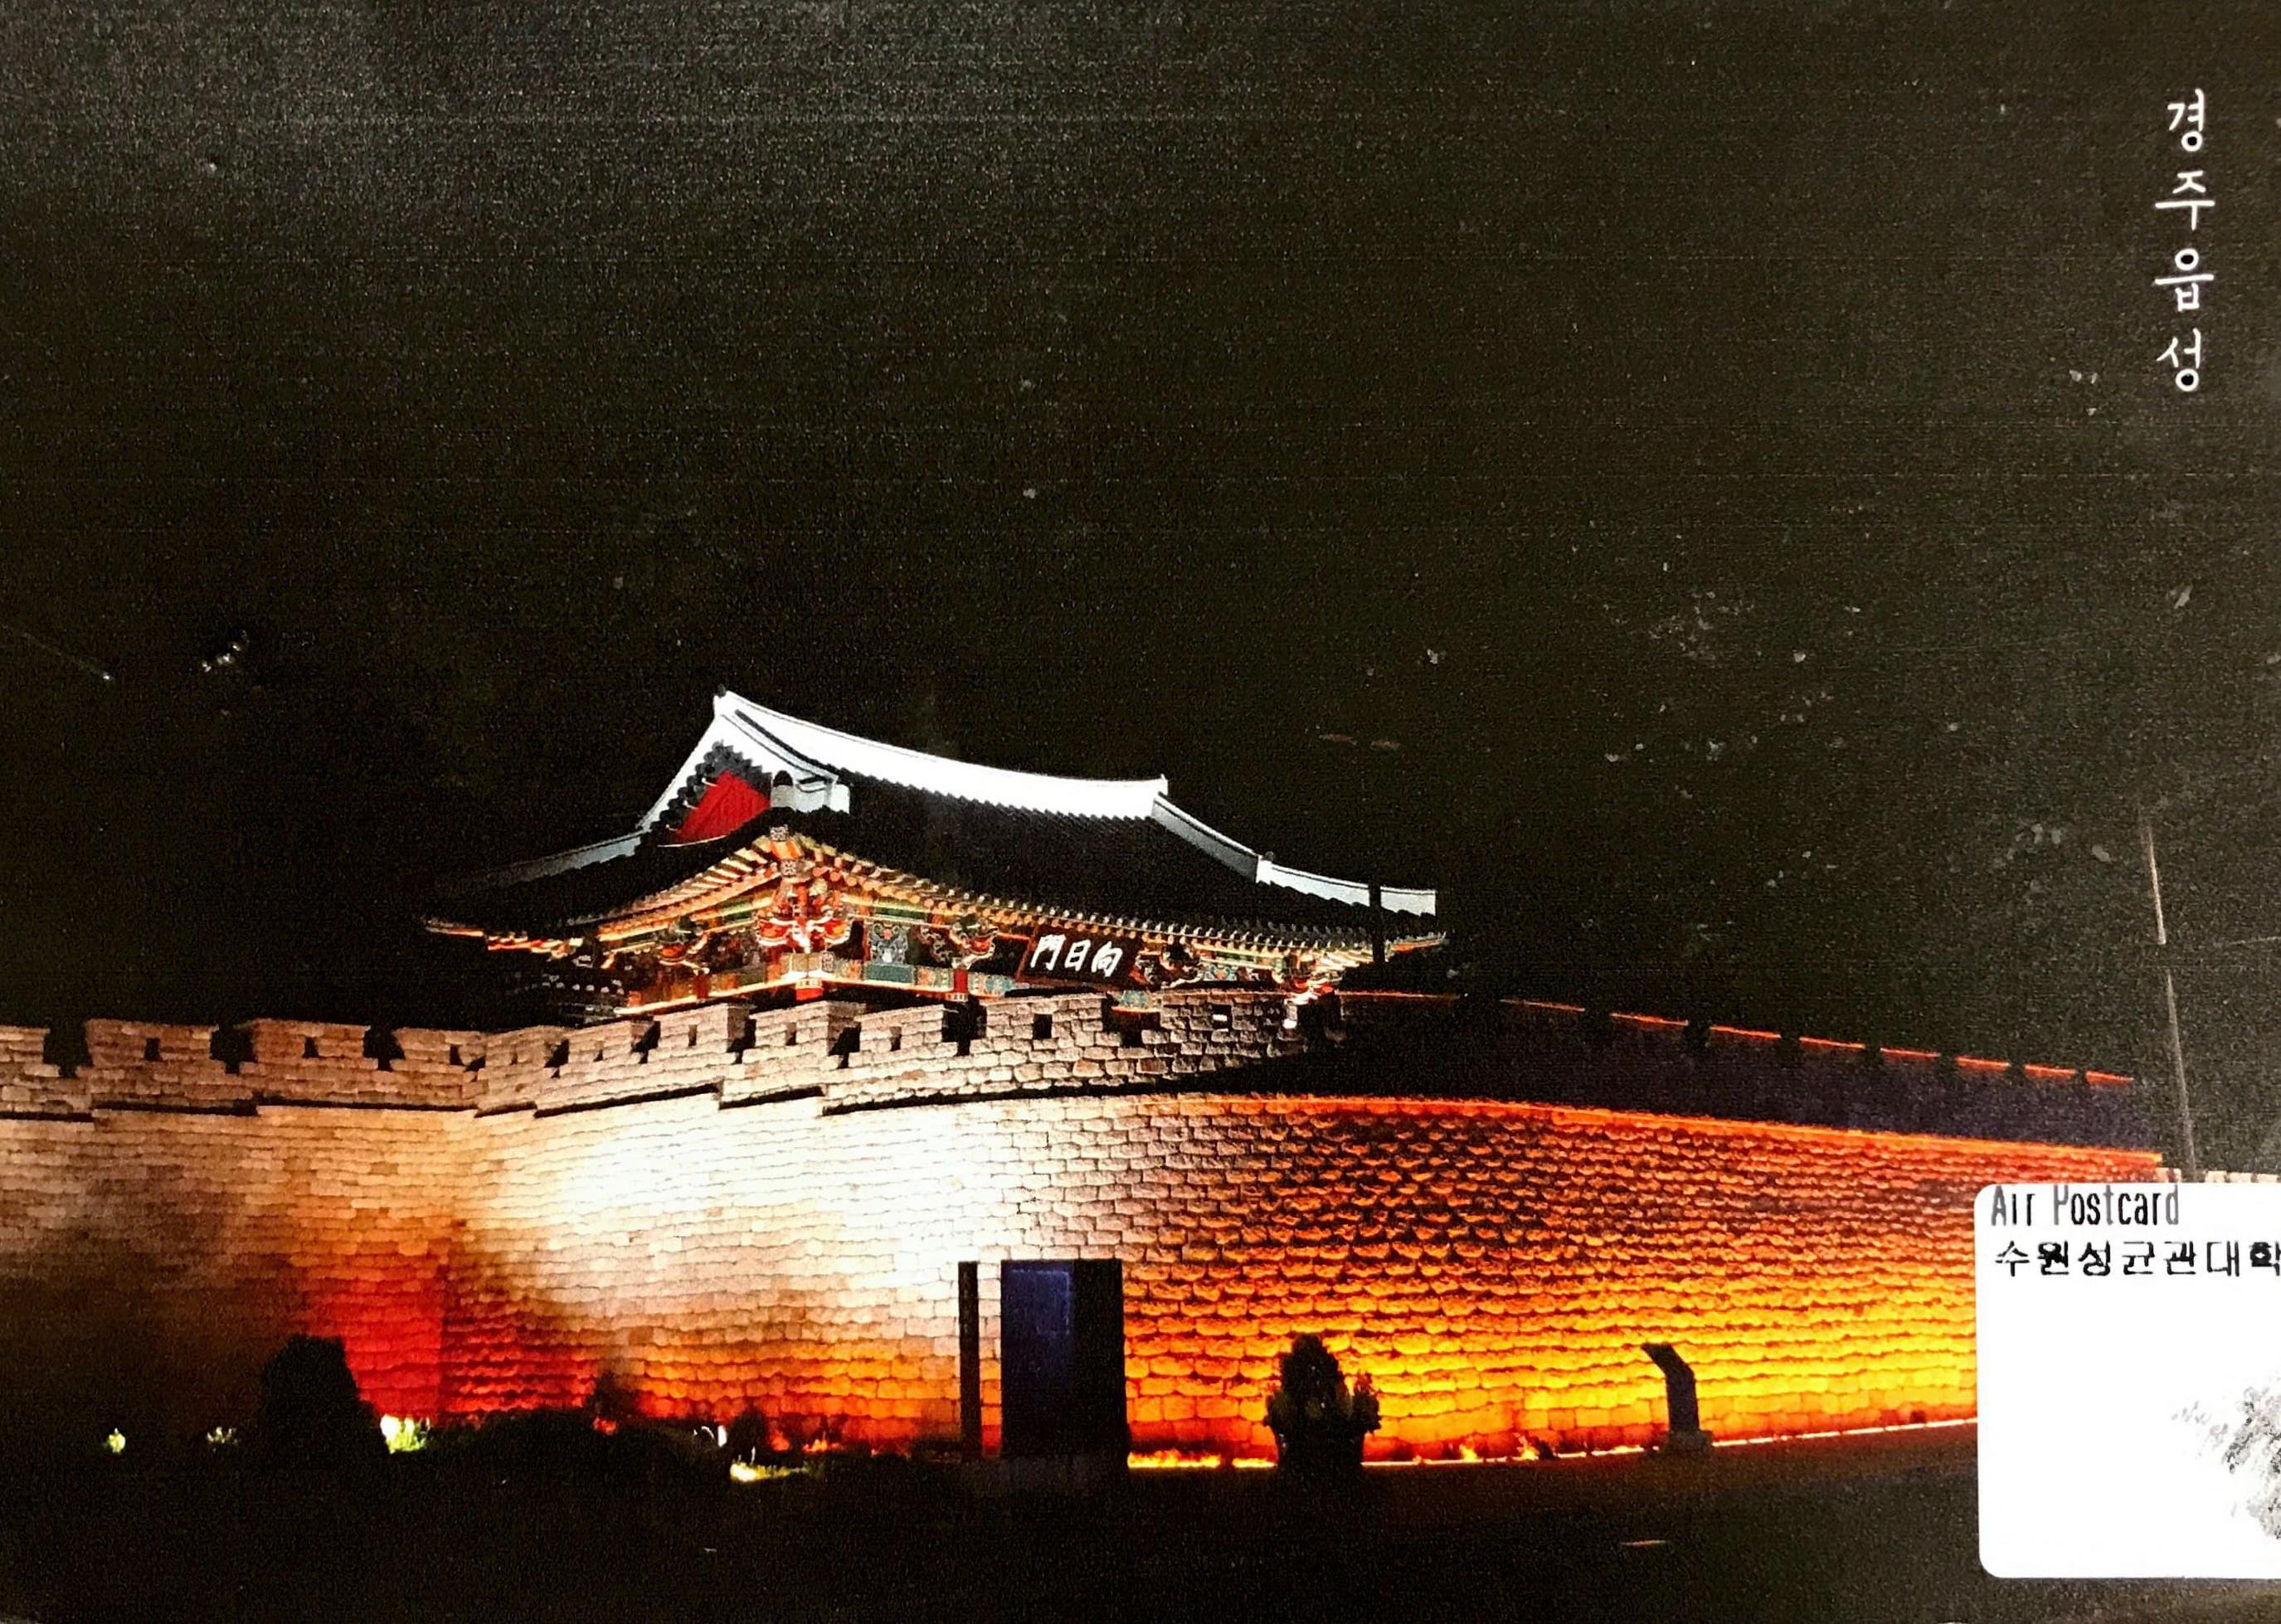 Cover of postcard from Minjin Jeong (SKKU, Korea)